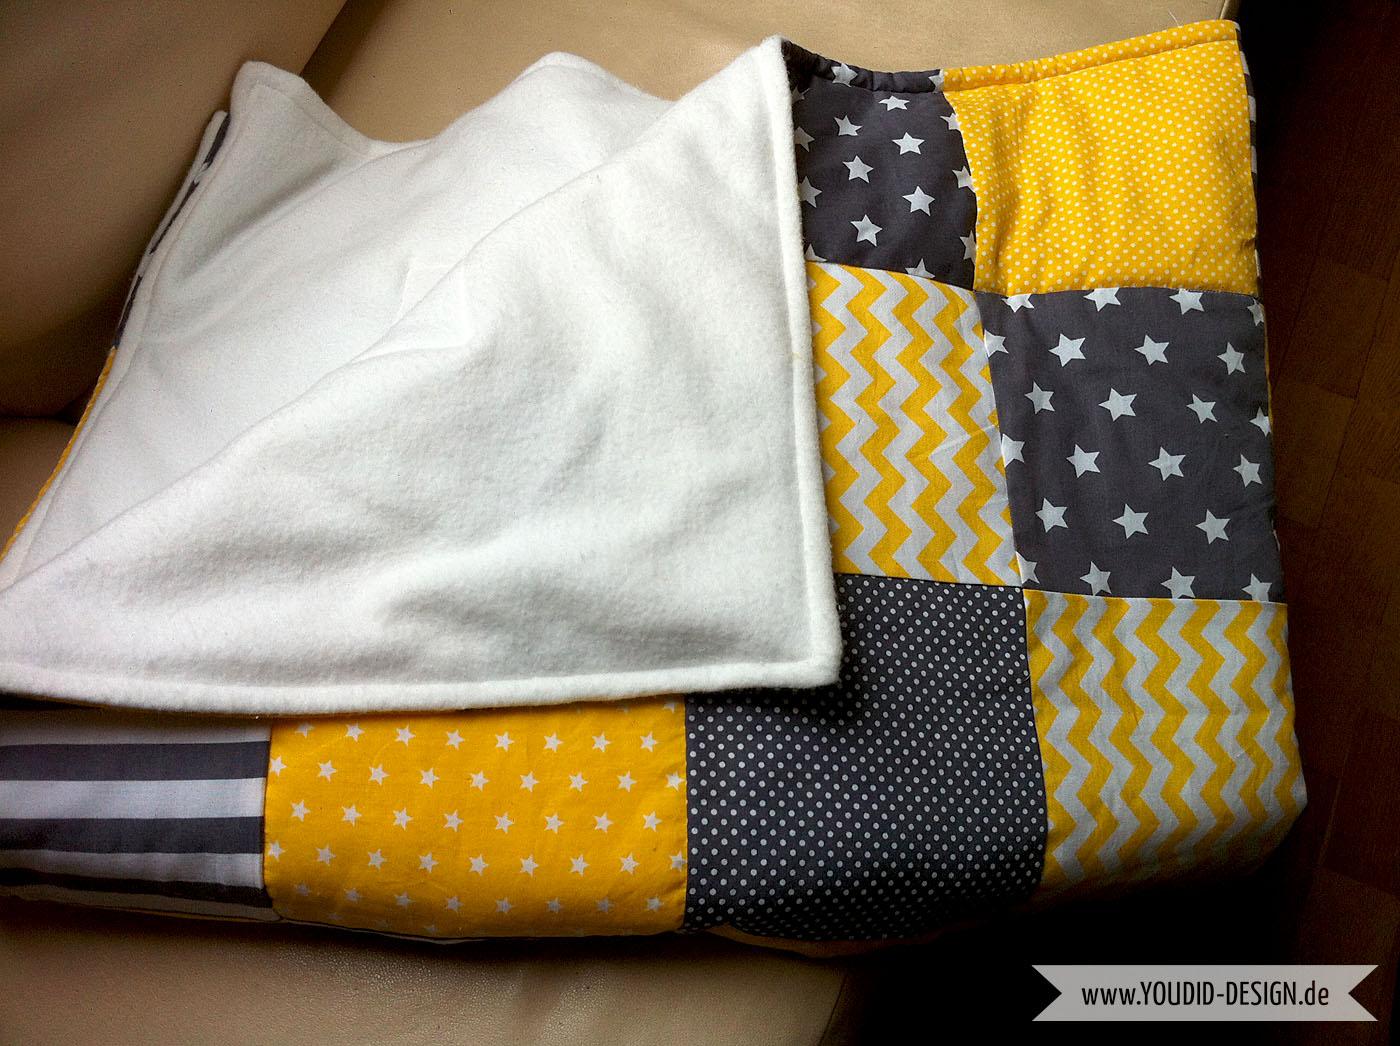 Selbstgenähte Patchworkdecke in grau gelb | www.youdid-design.de